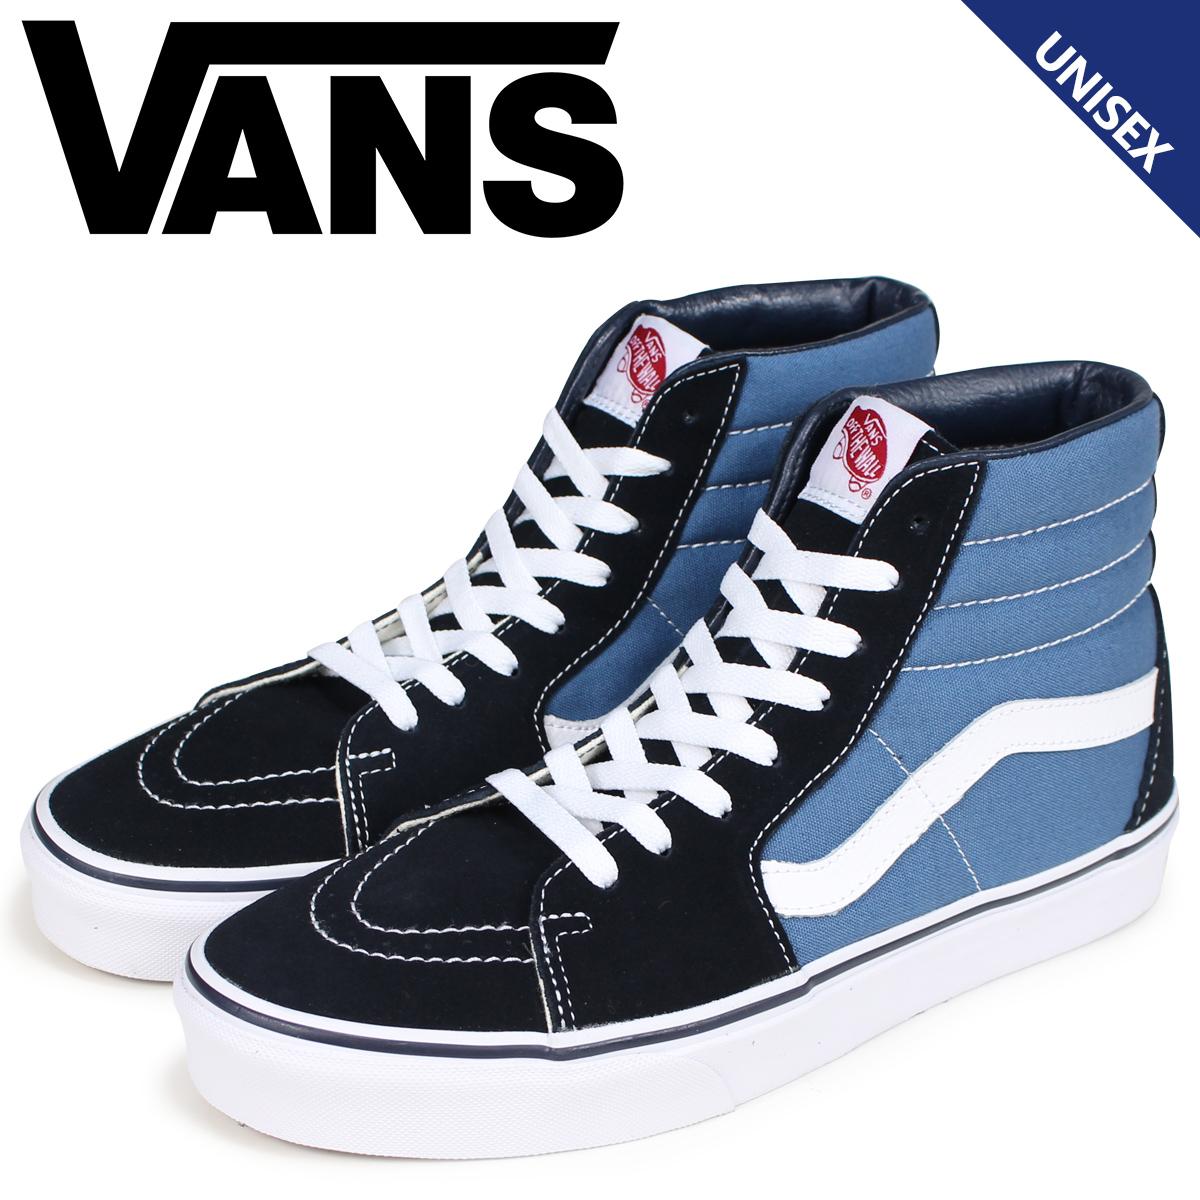 95a8b9b83d Vans SK8-HI sneakers men gap Dis VANS station wagons skating high  VN000D5INVY navy  9 5 Shinnyu load